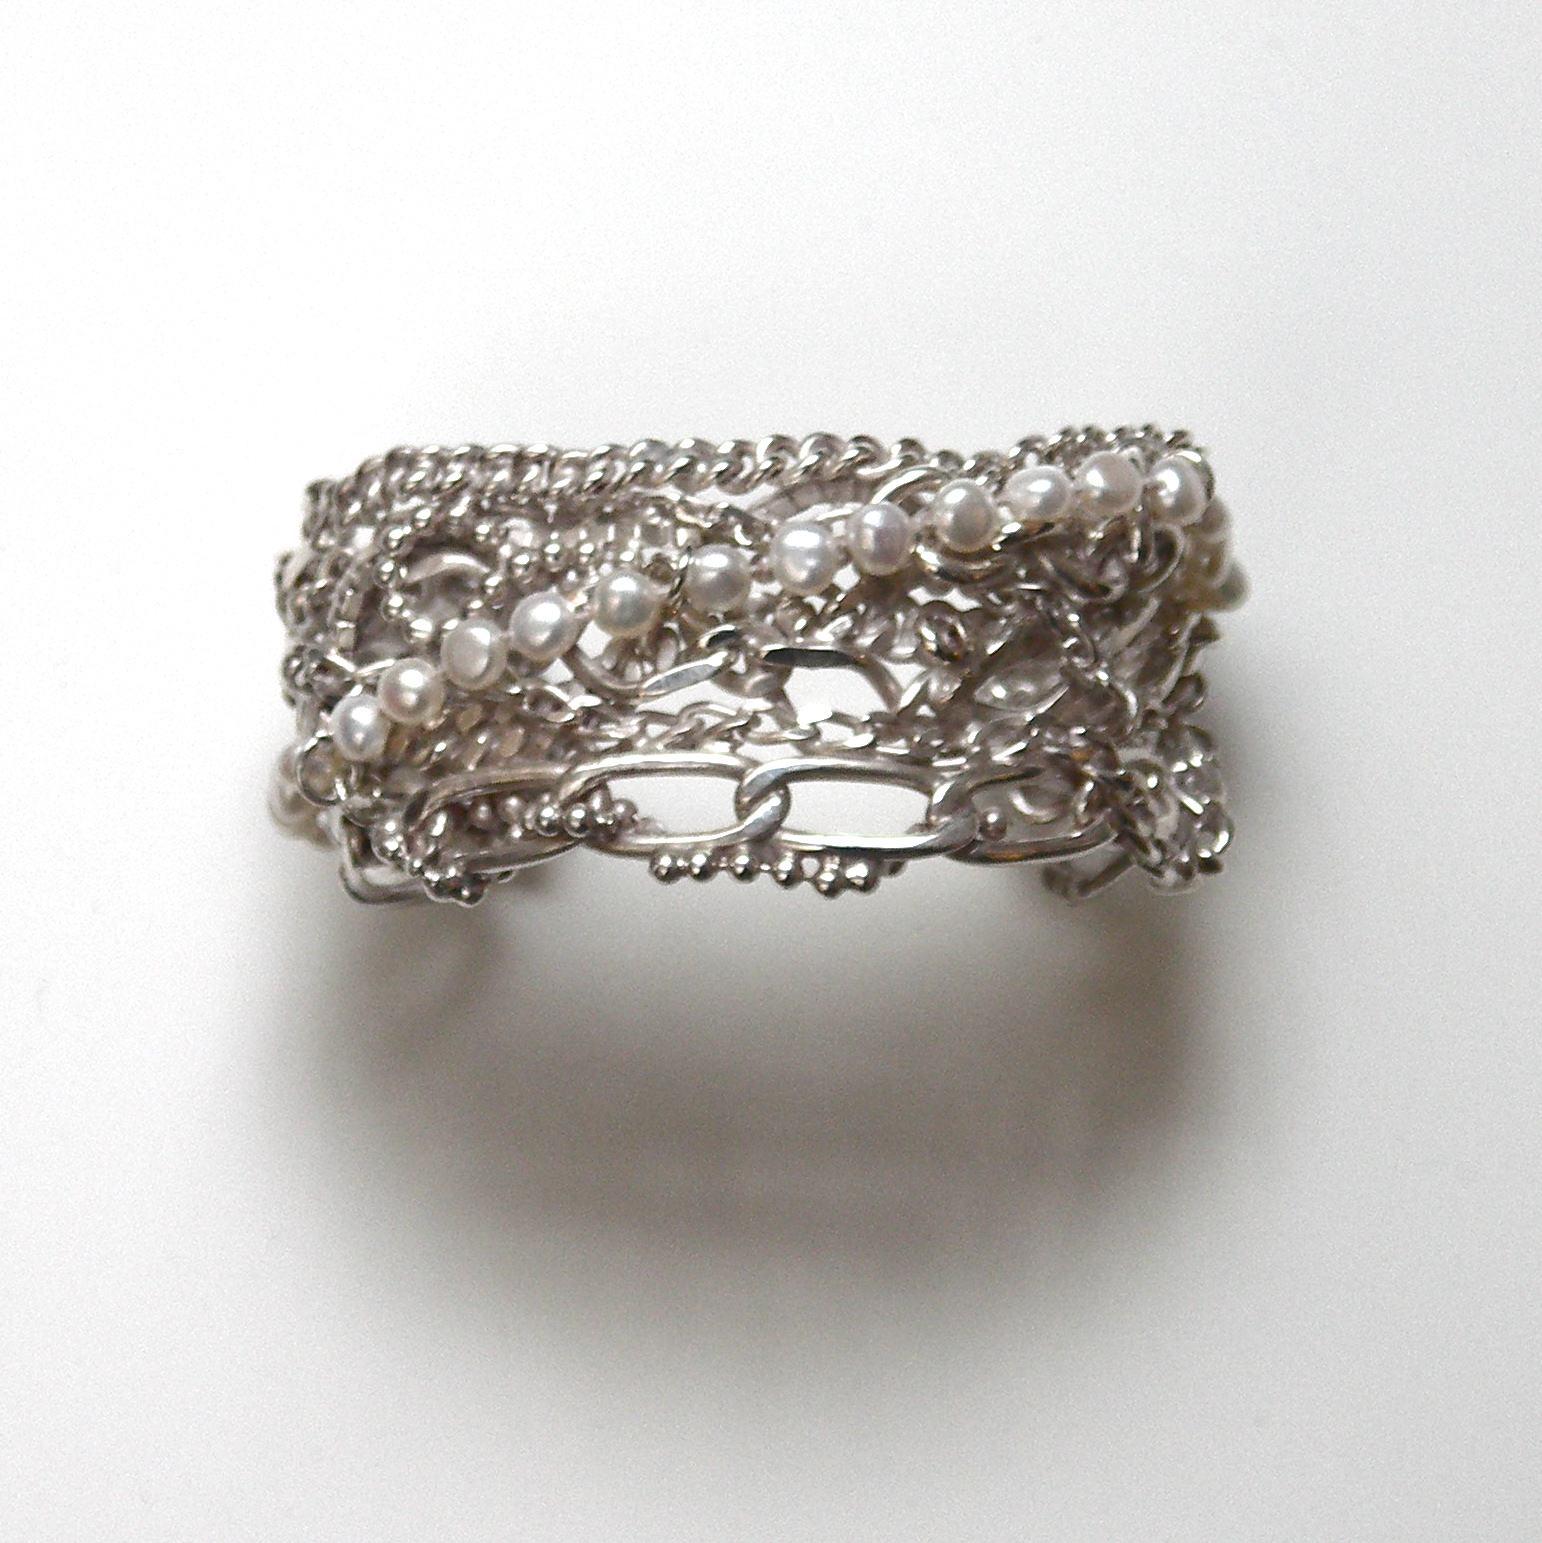 TCC-Tangled chain and pearl cuff